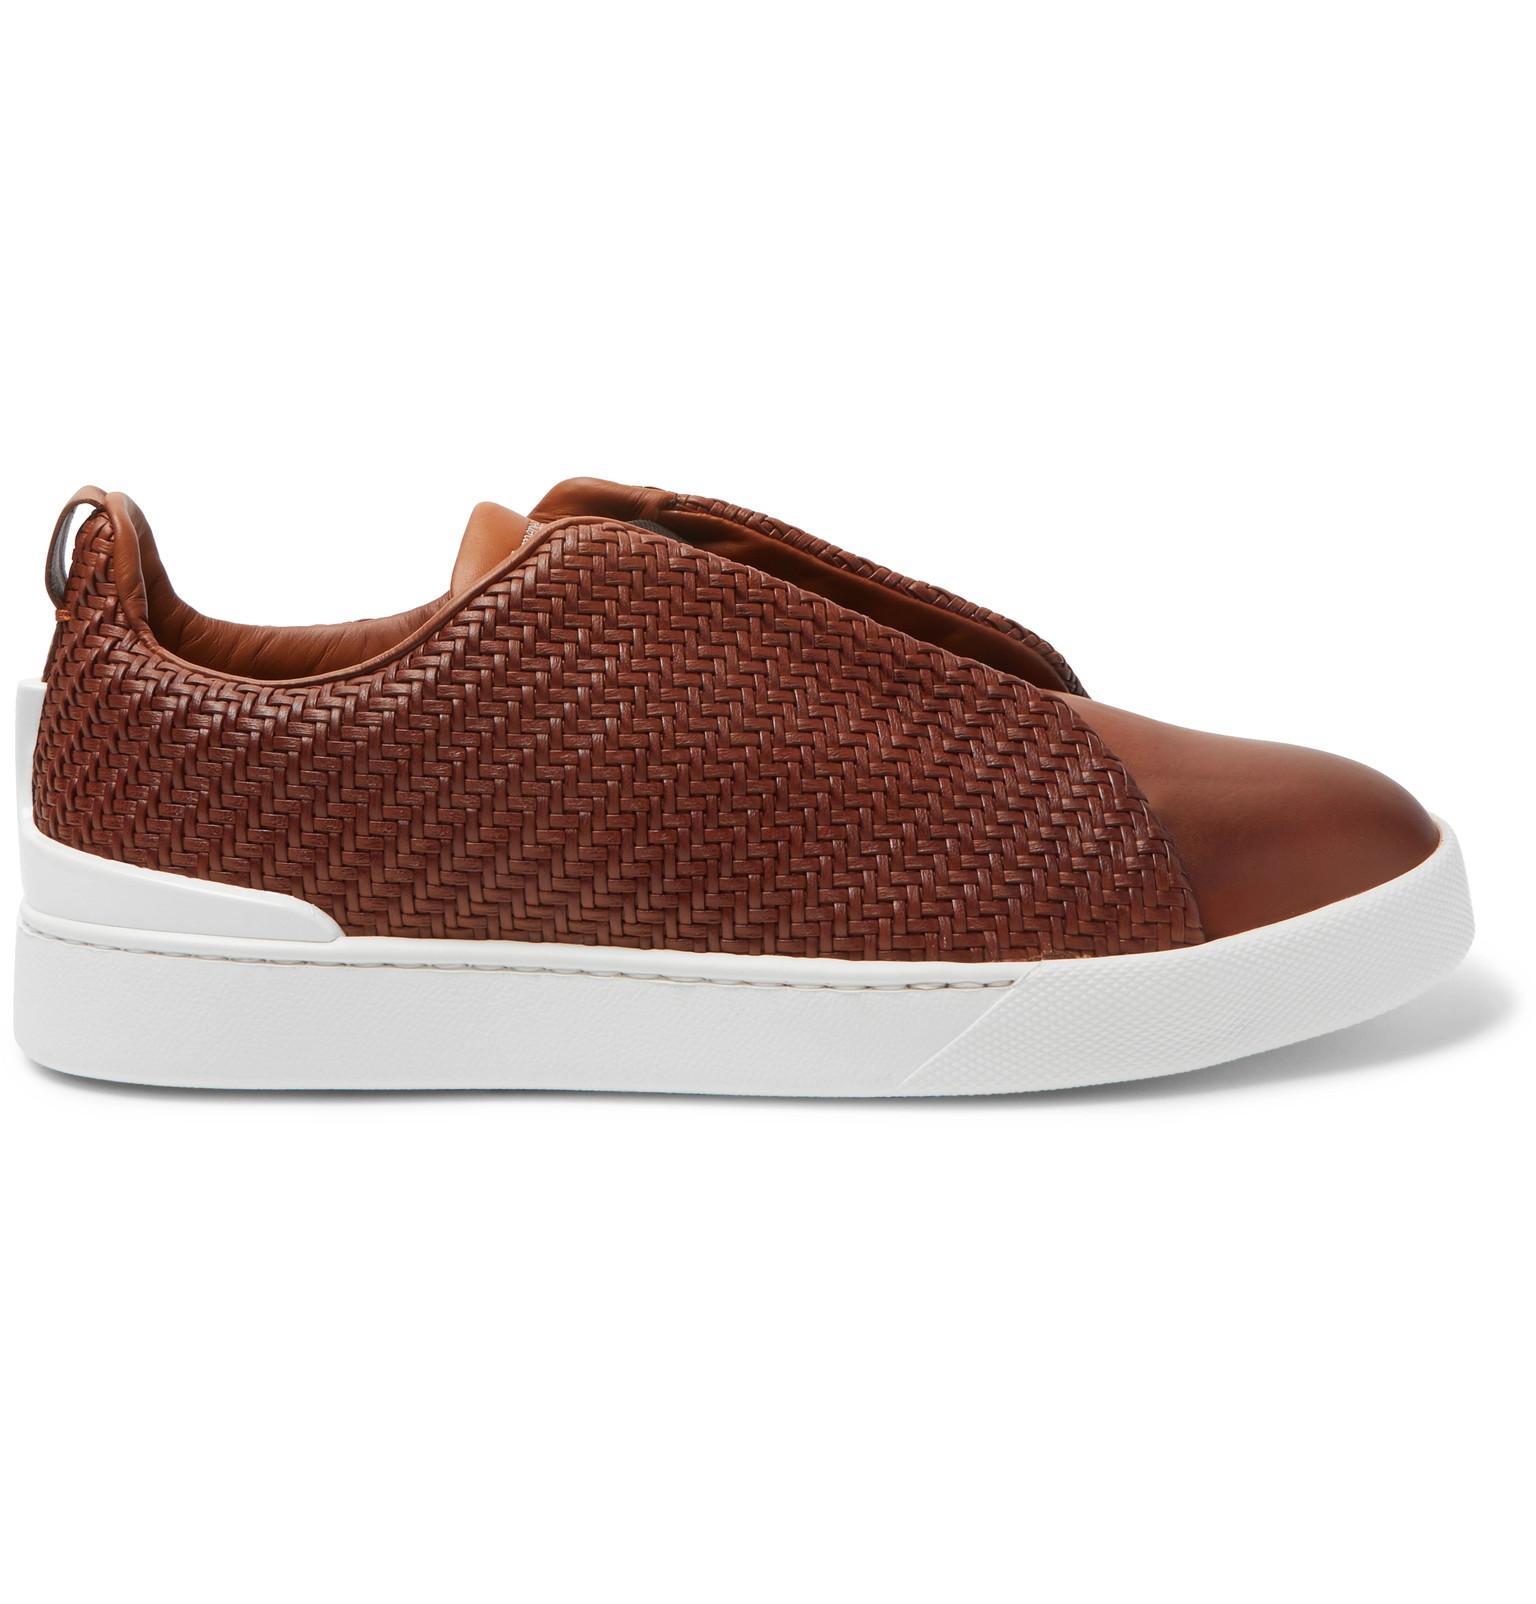 cbd60ad0 Ermenegildo Zegna Brown Triple Stitch Pelle Tessuta Leather Slip-on  Sneakers for men